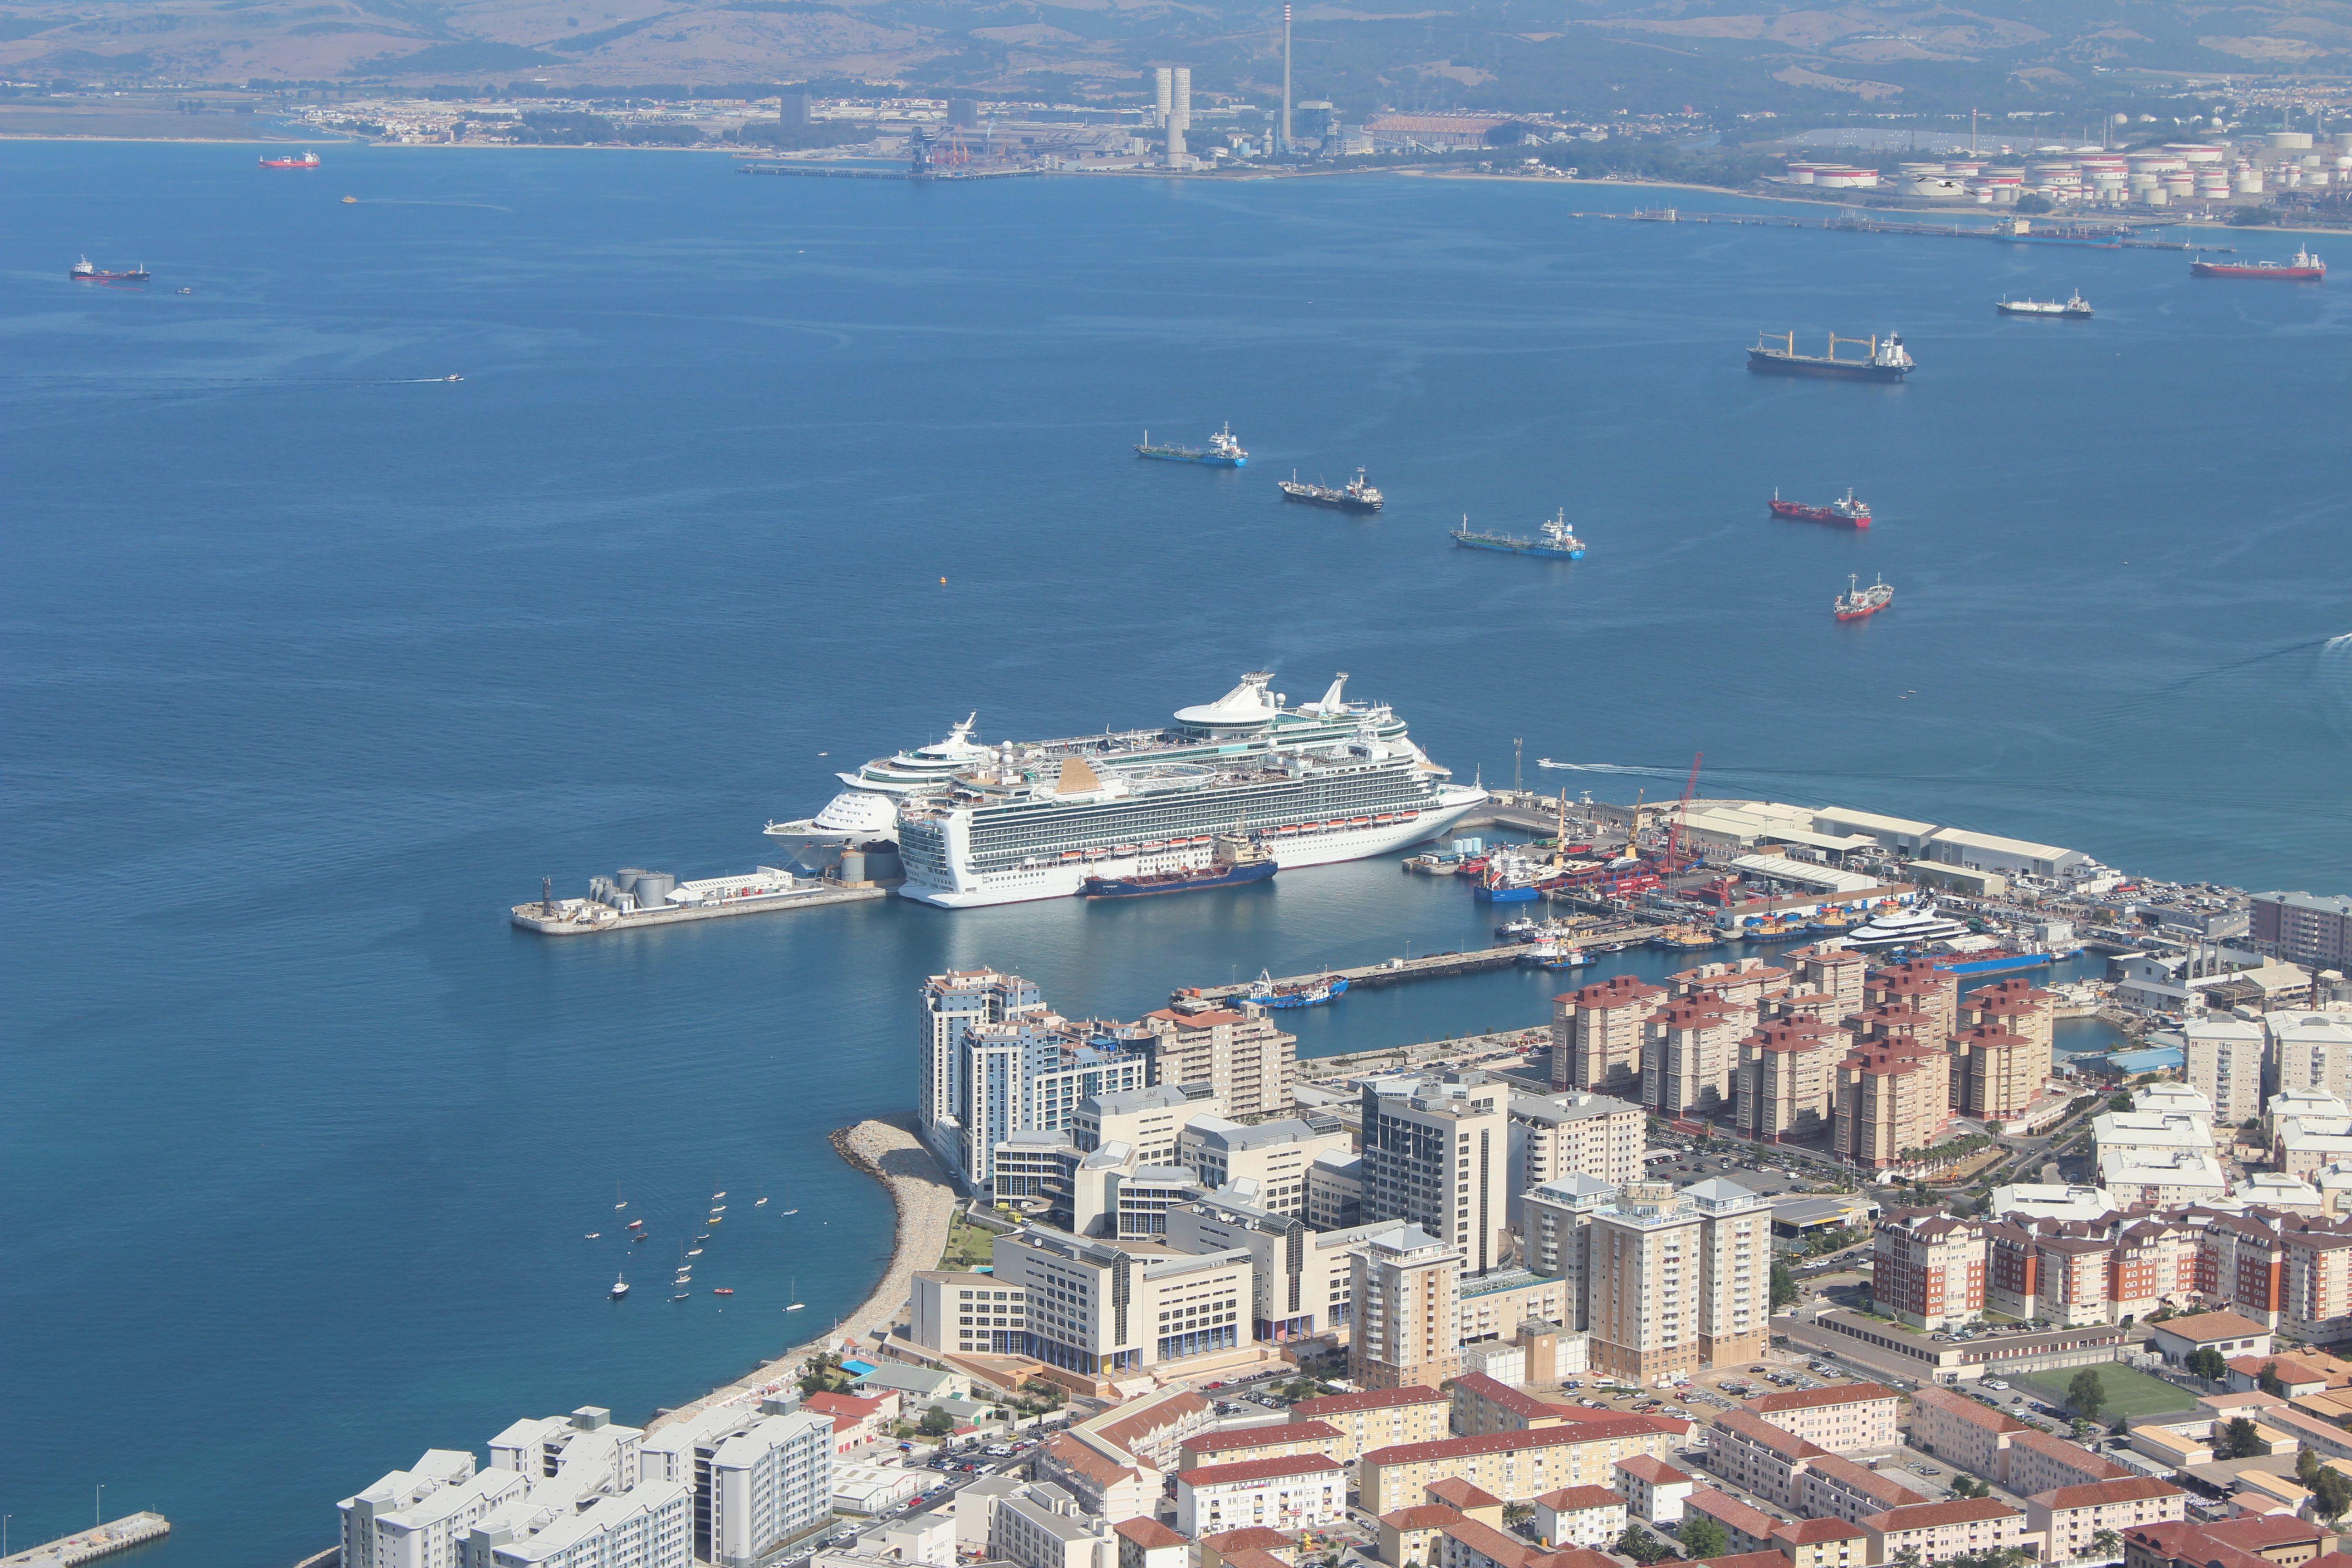 p cruises azura and royal caribbean uk independence of the seas